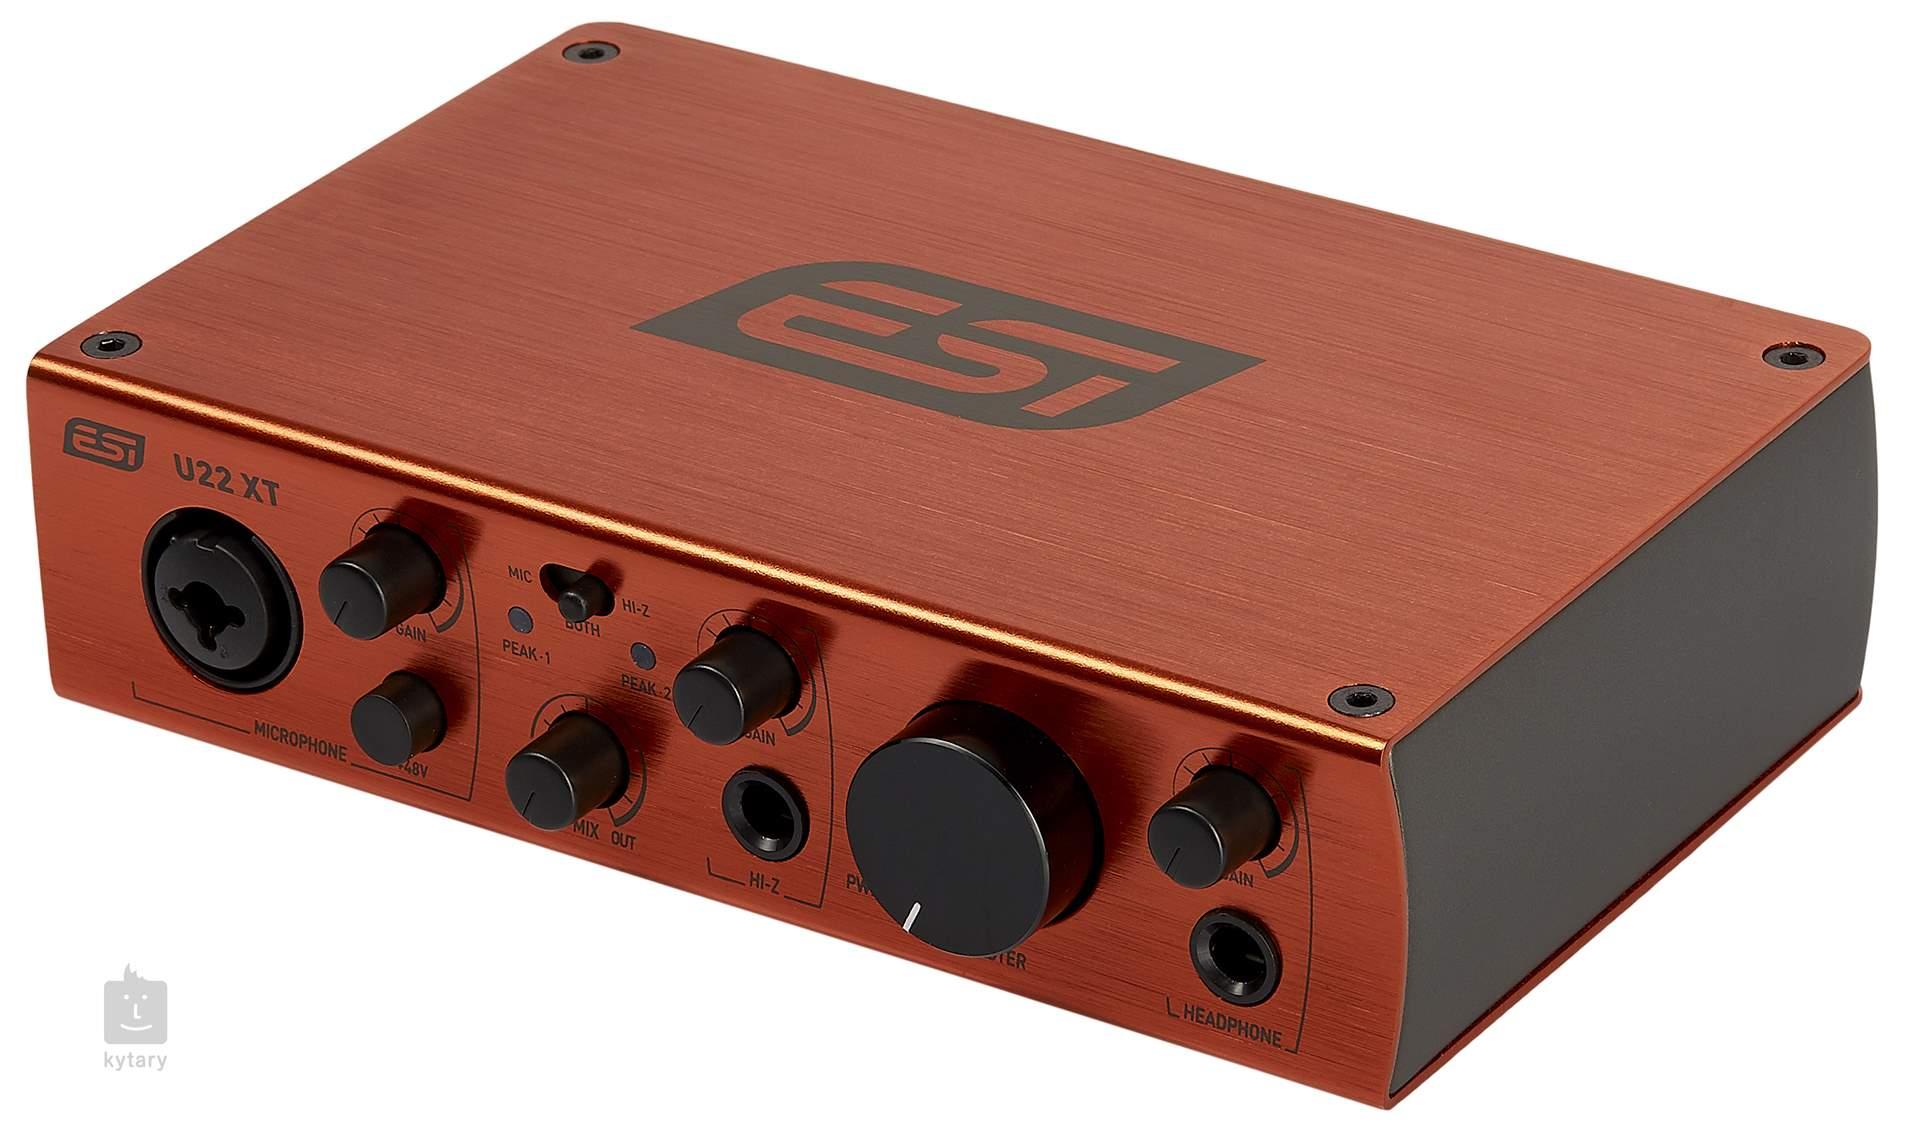 ESI U22 XT USB Sound Card